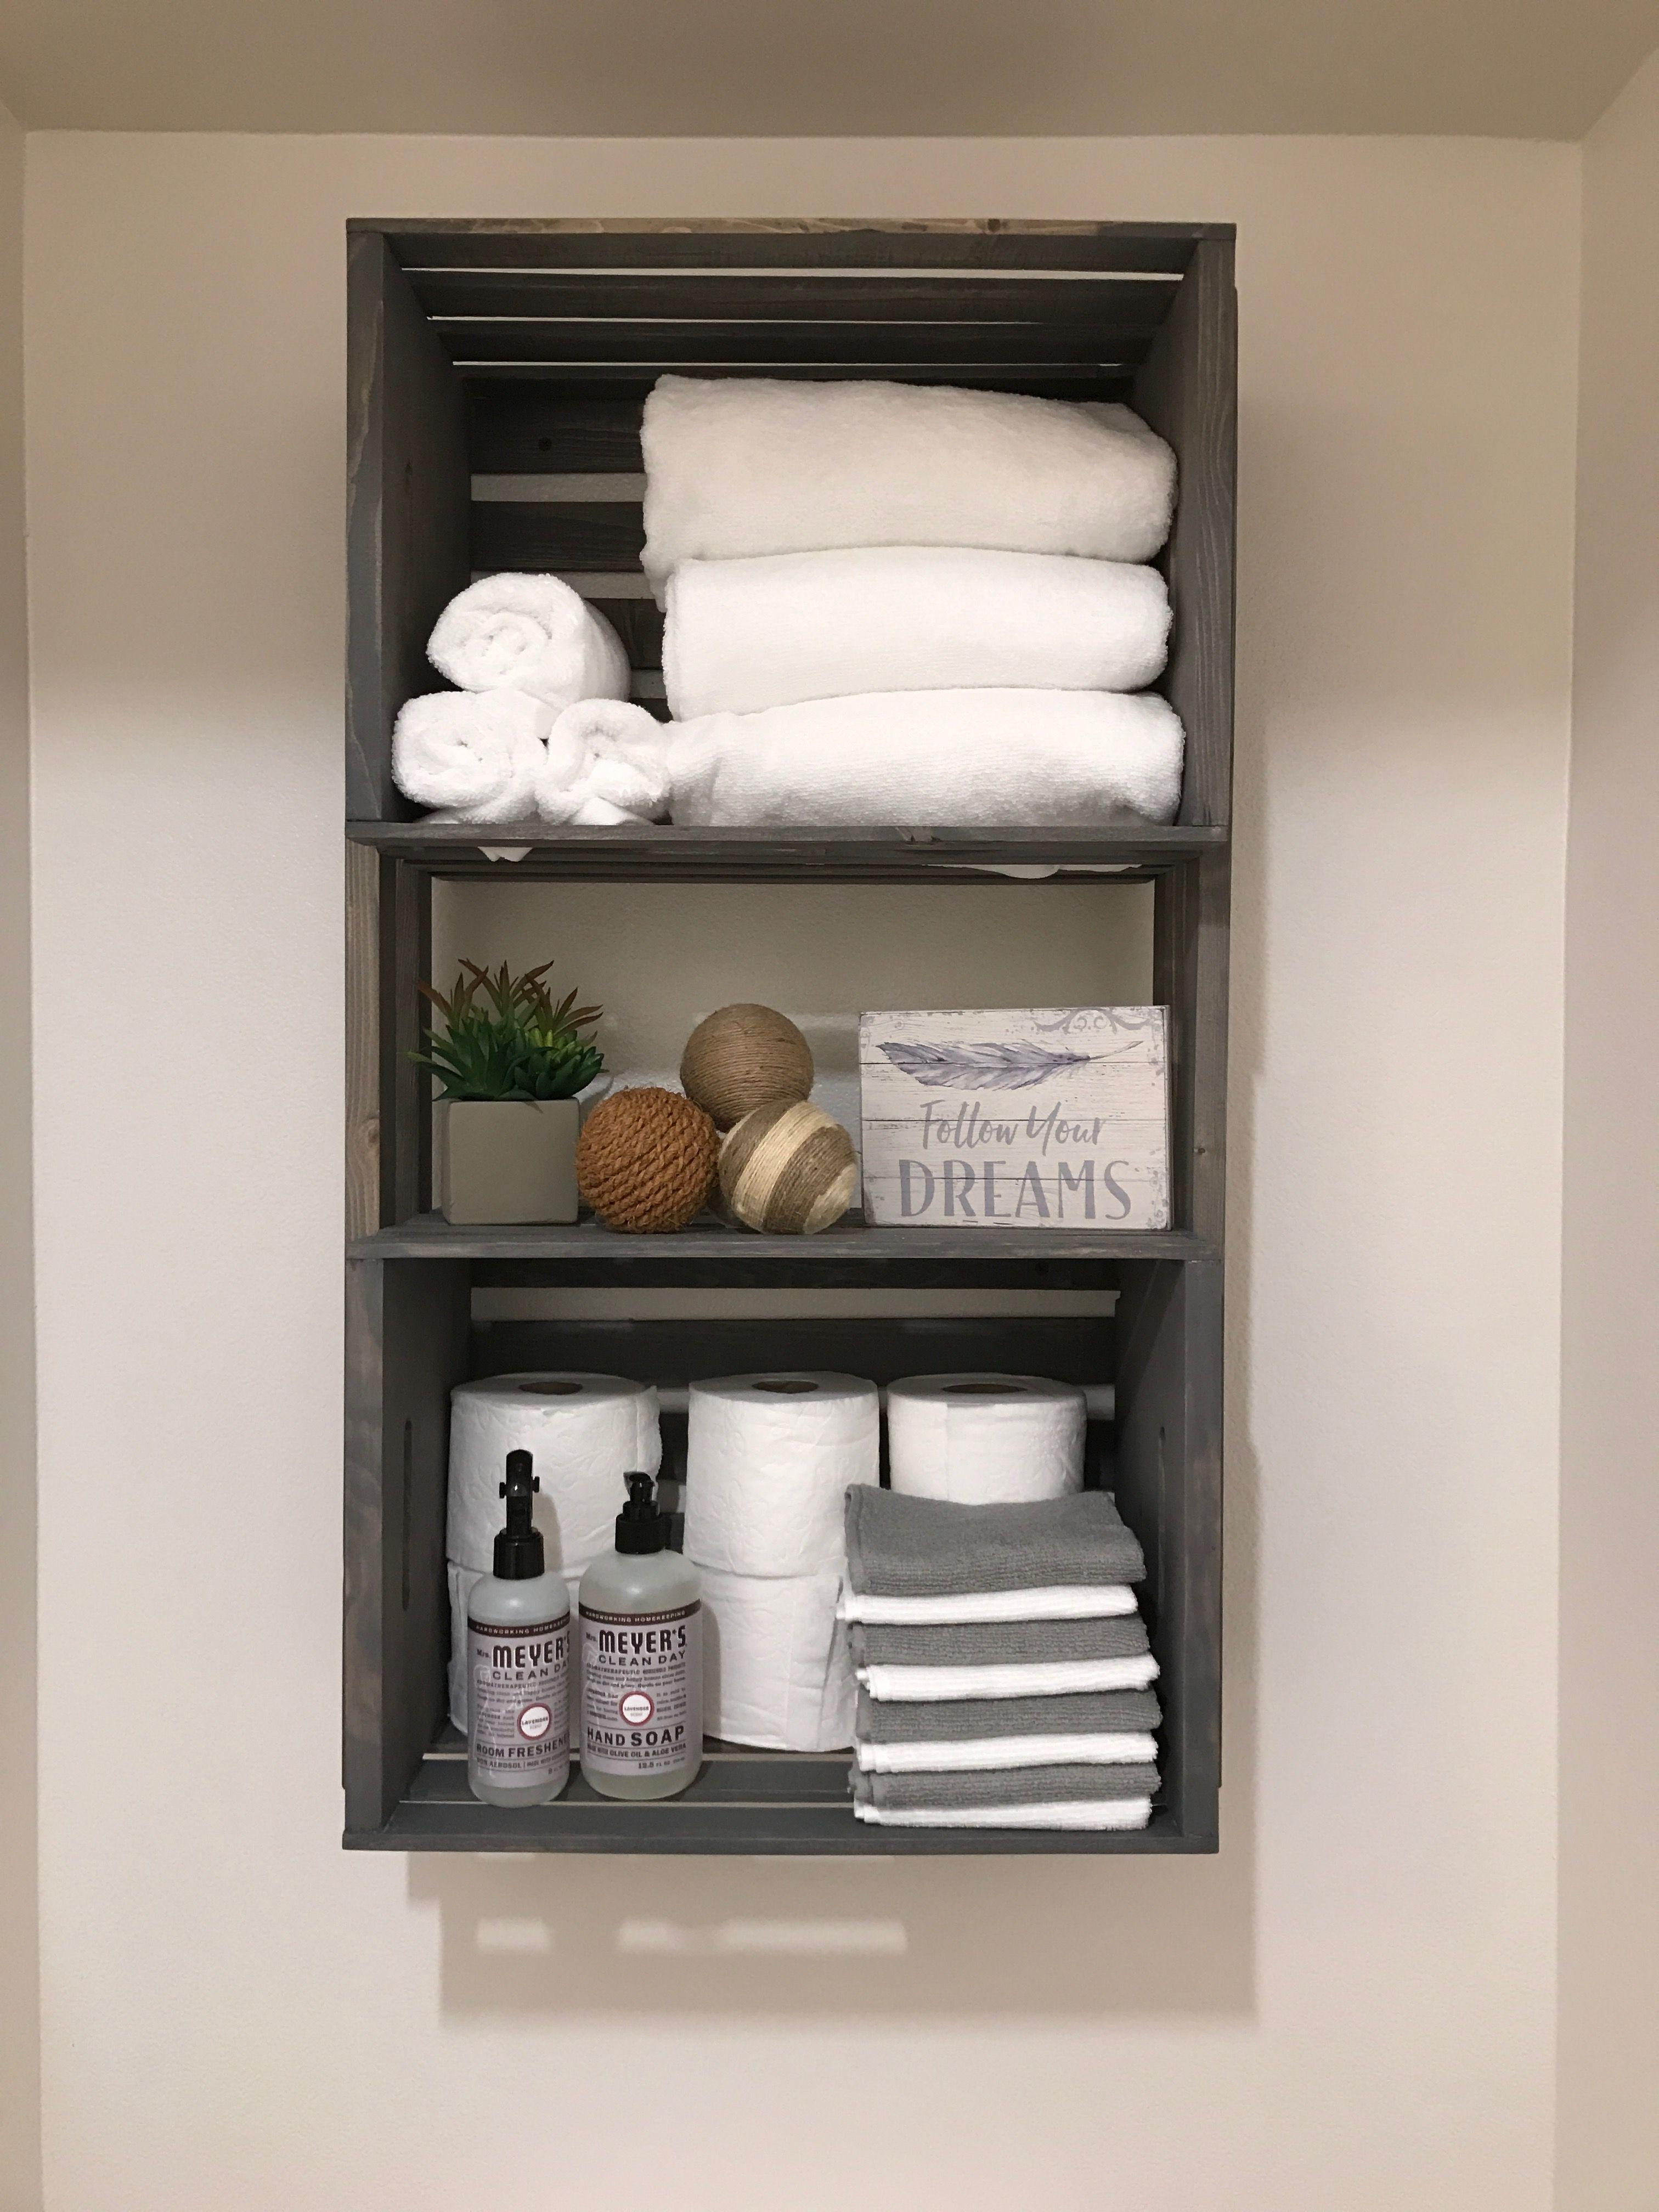 Love my storage above the toilet Home decor Pinterest